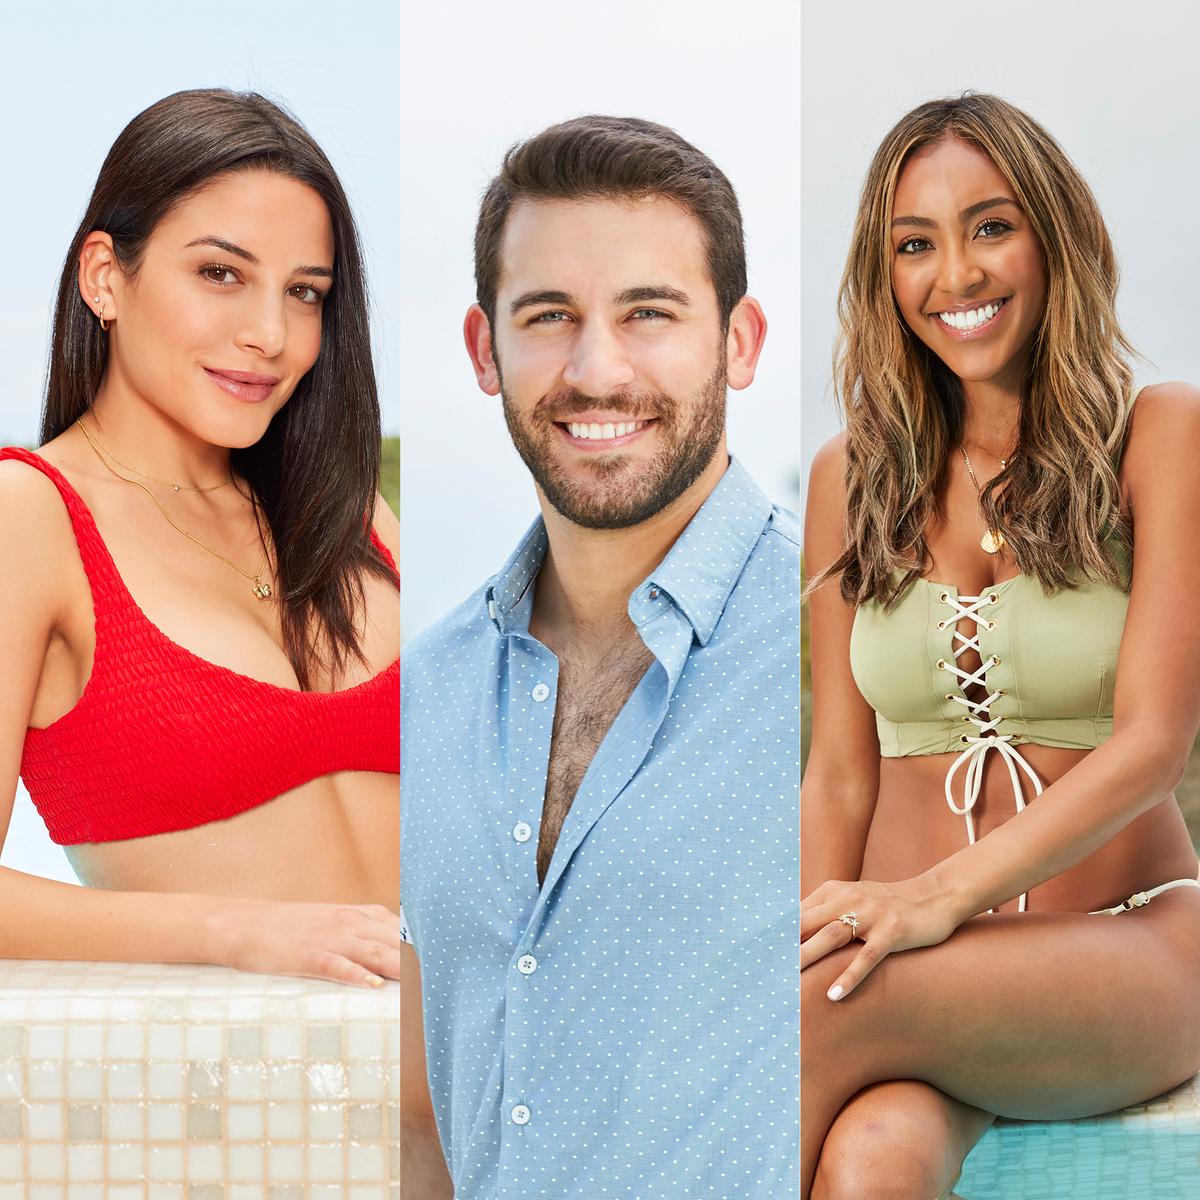 Bachelor in Paradise Temporada 6: todo lo que necesita saber antes de que comience